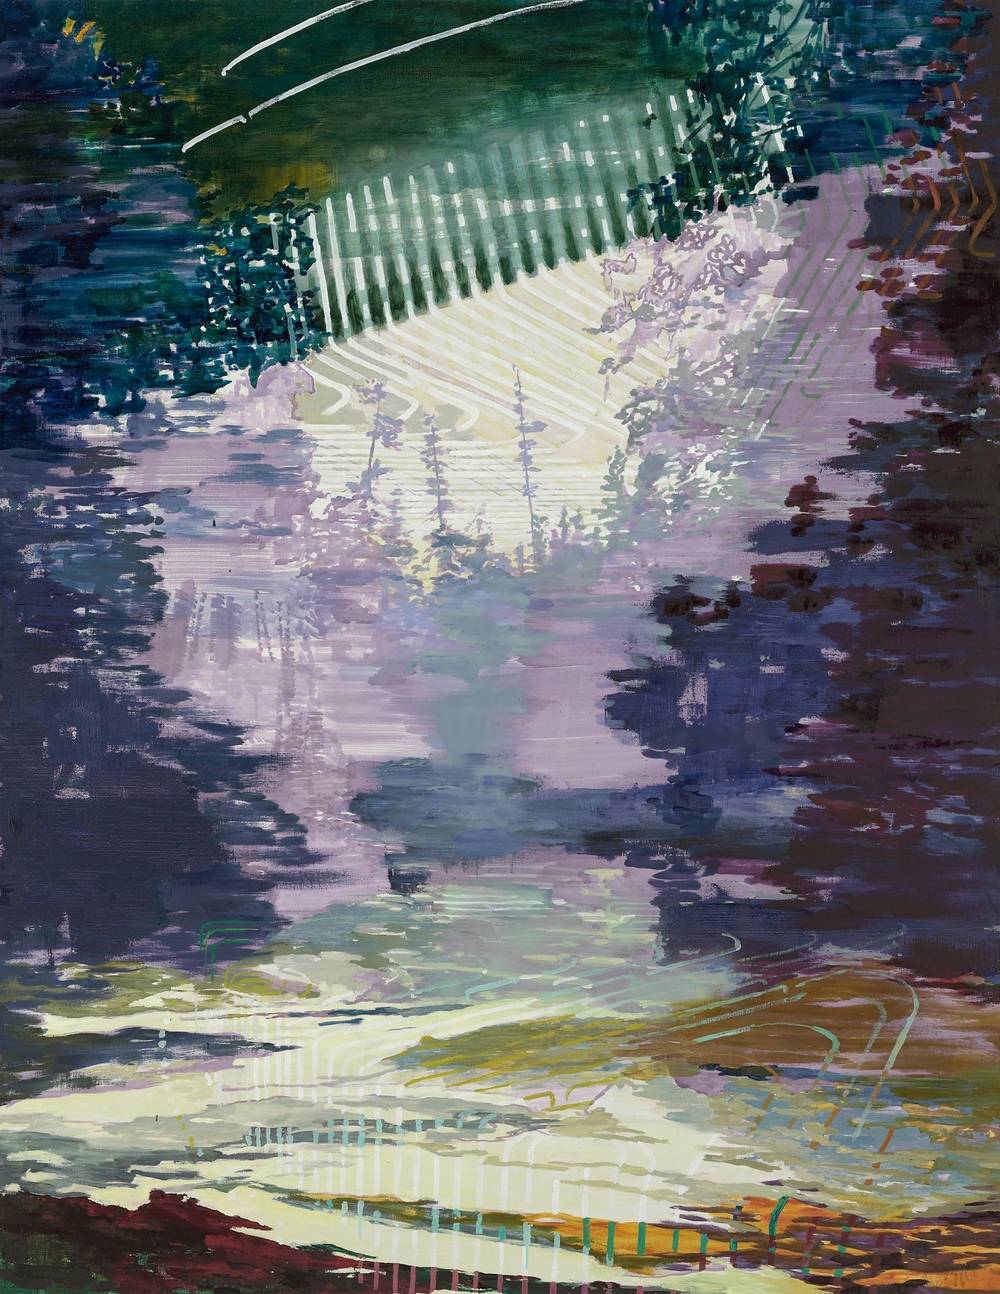 Neon Night Sky, 2009, 180 x 140 cm, oil on canvas